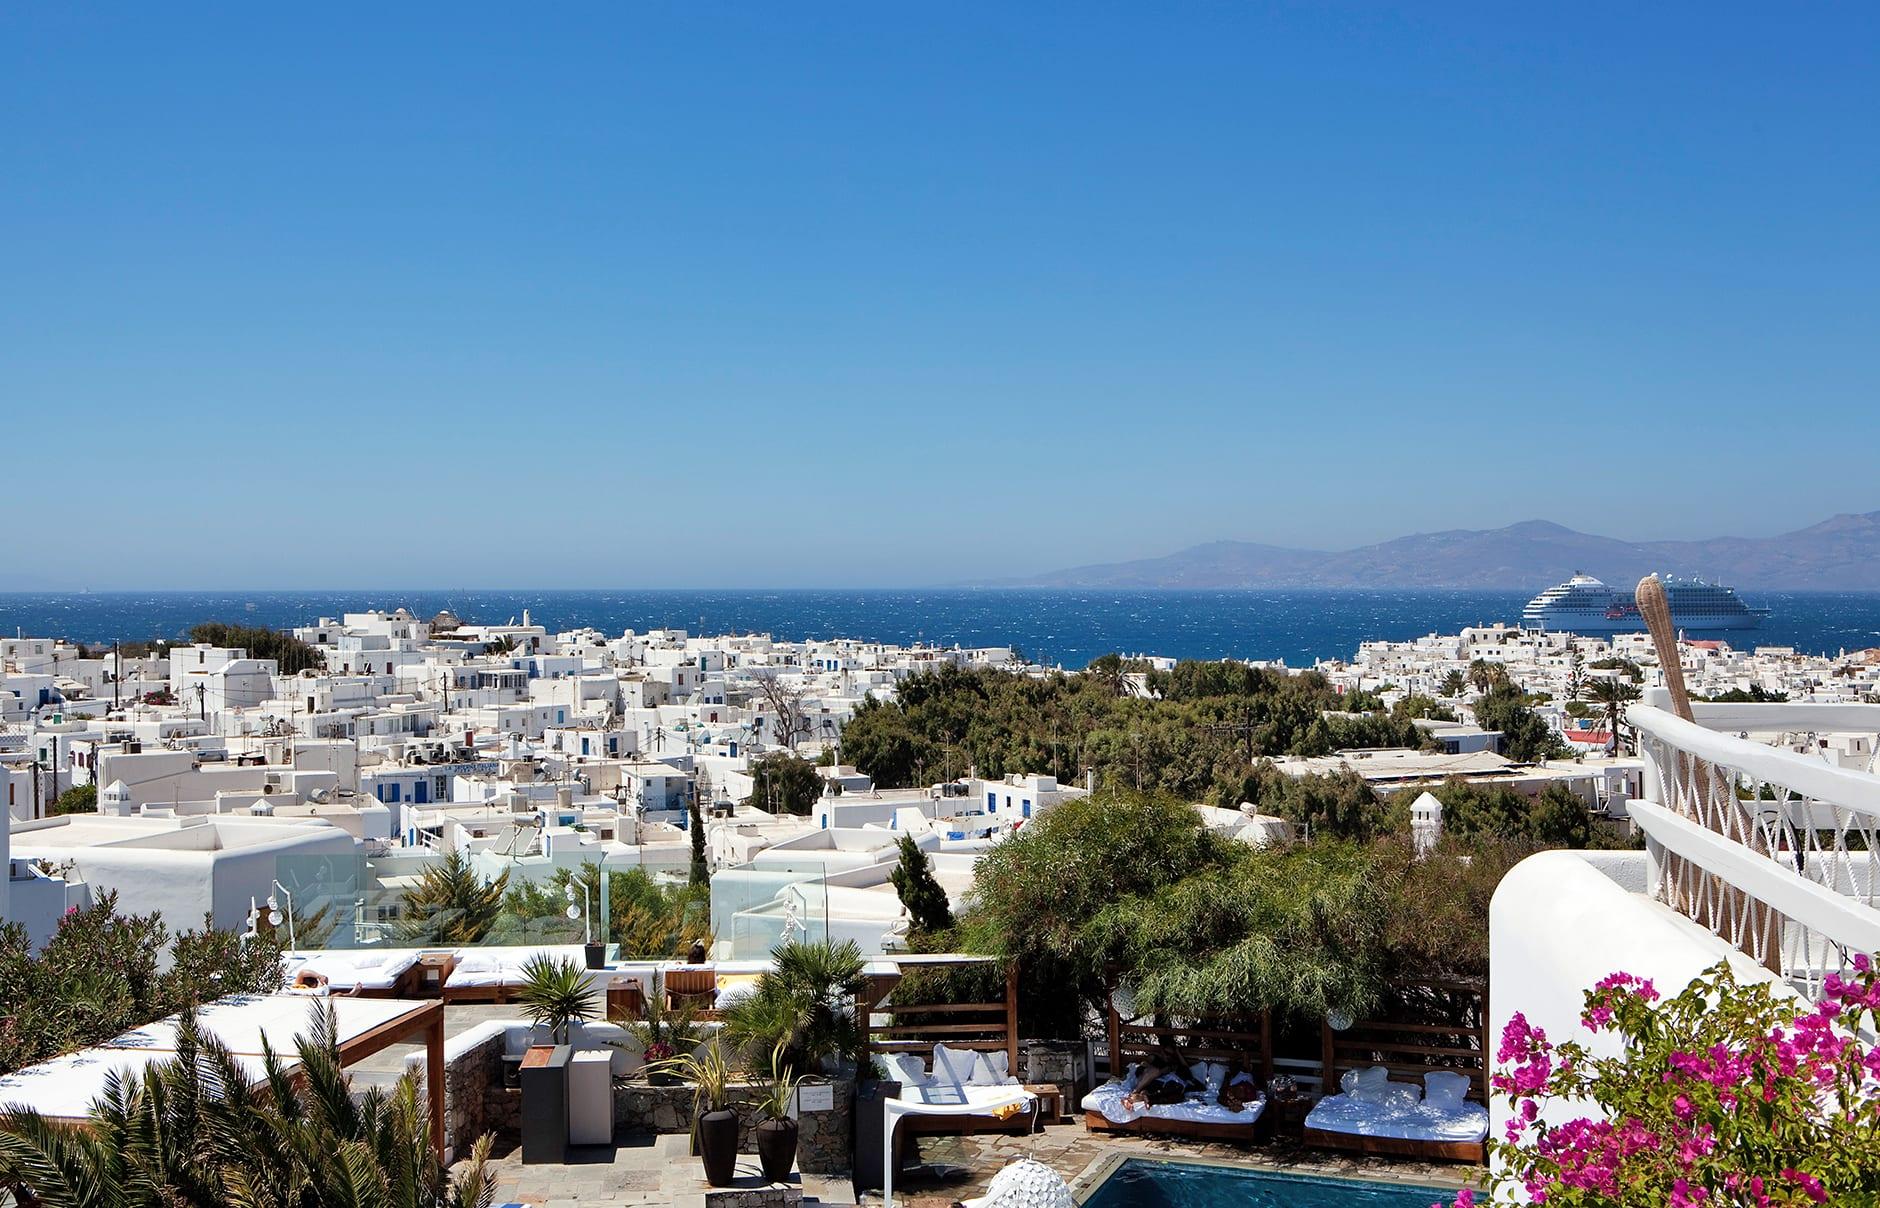 Belvedere Mykonos, Greece. © Belvedere Mykonos